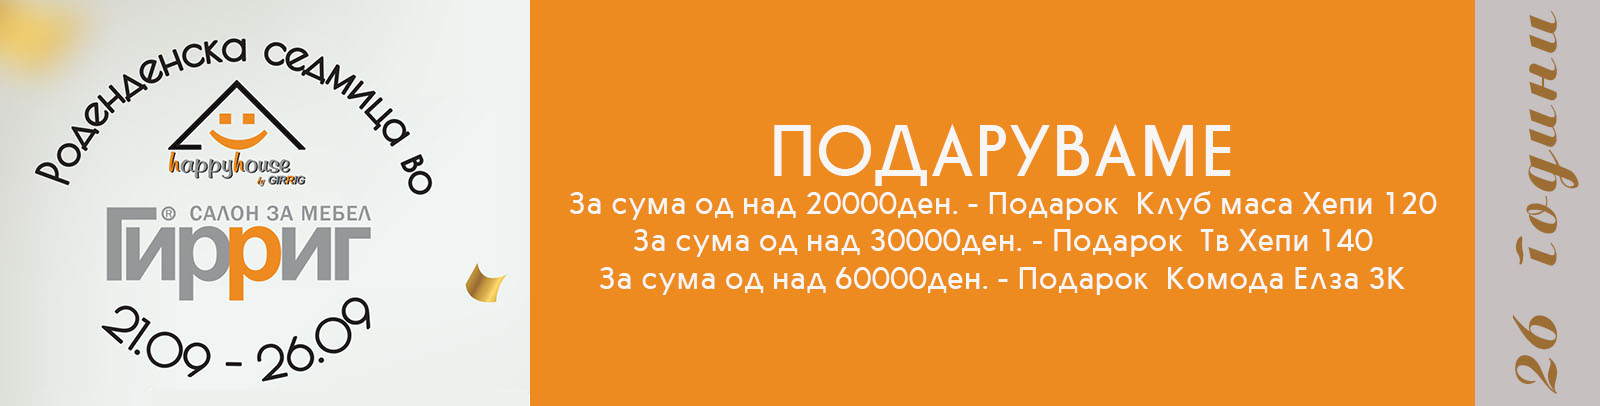 Банер 26 години Гир Риг десктоп